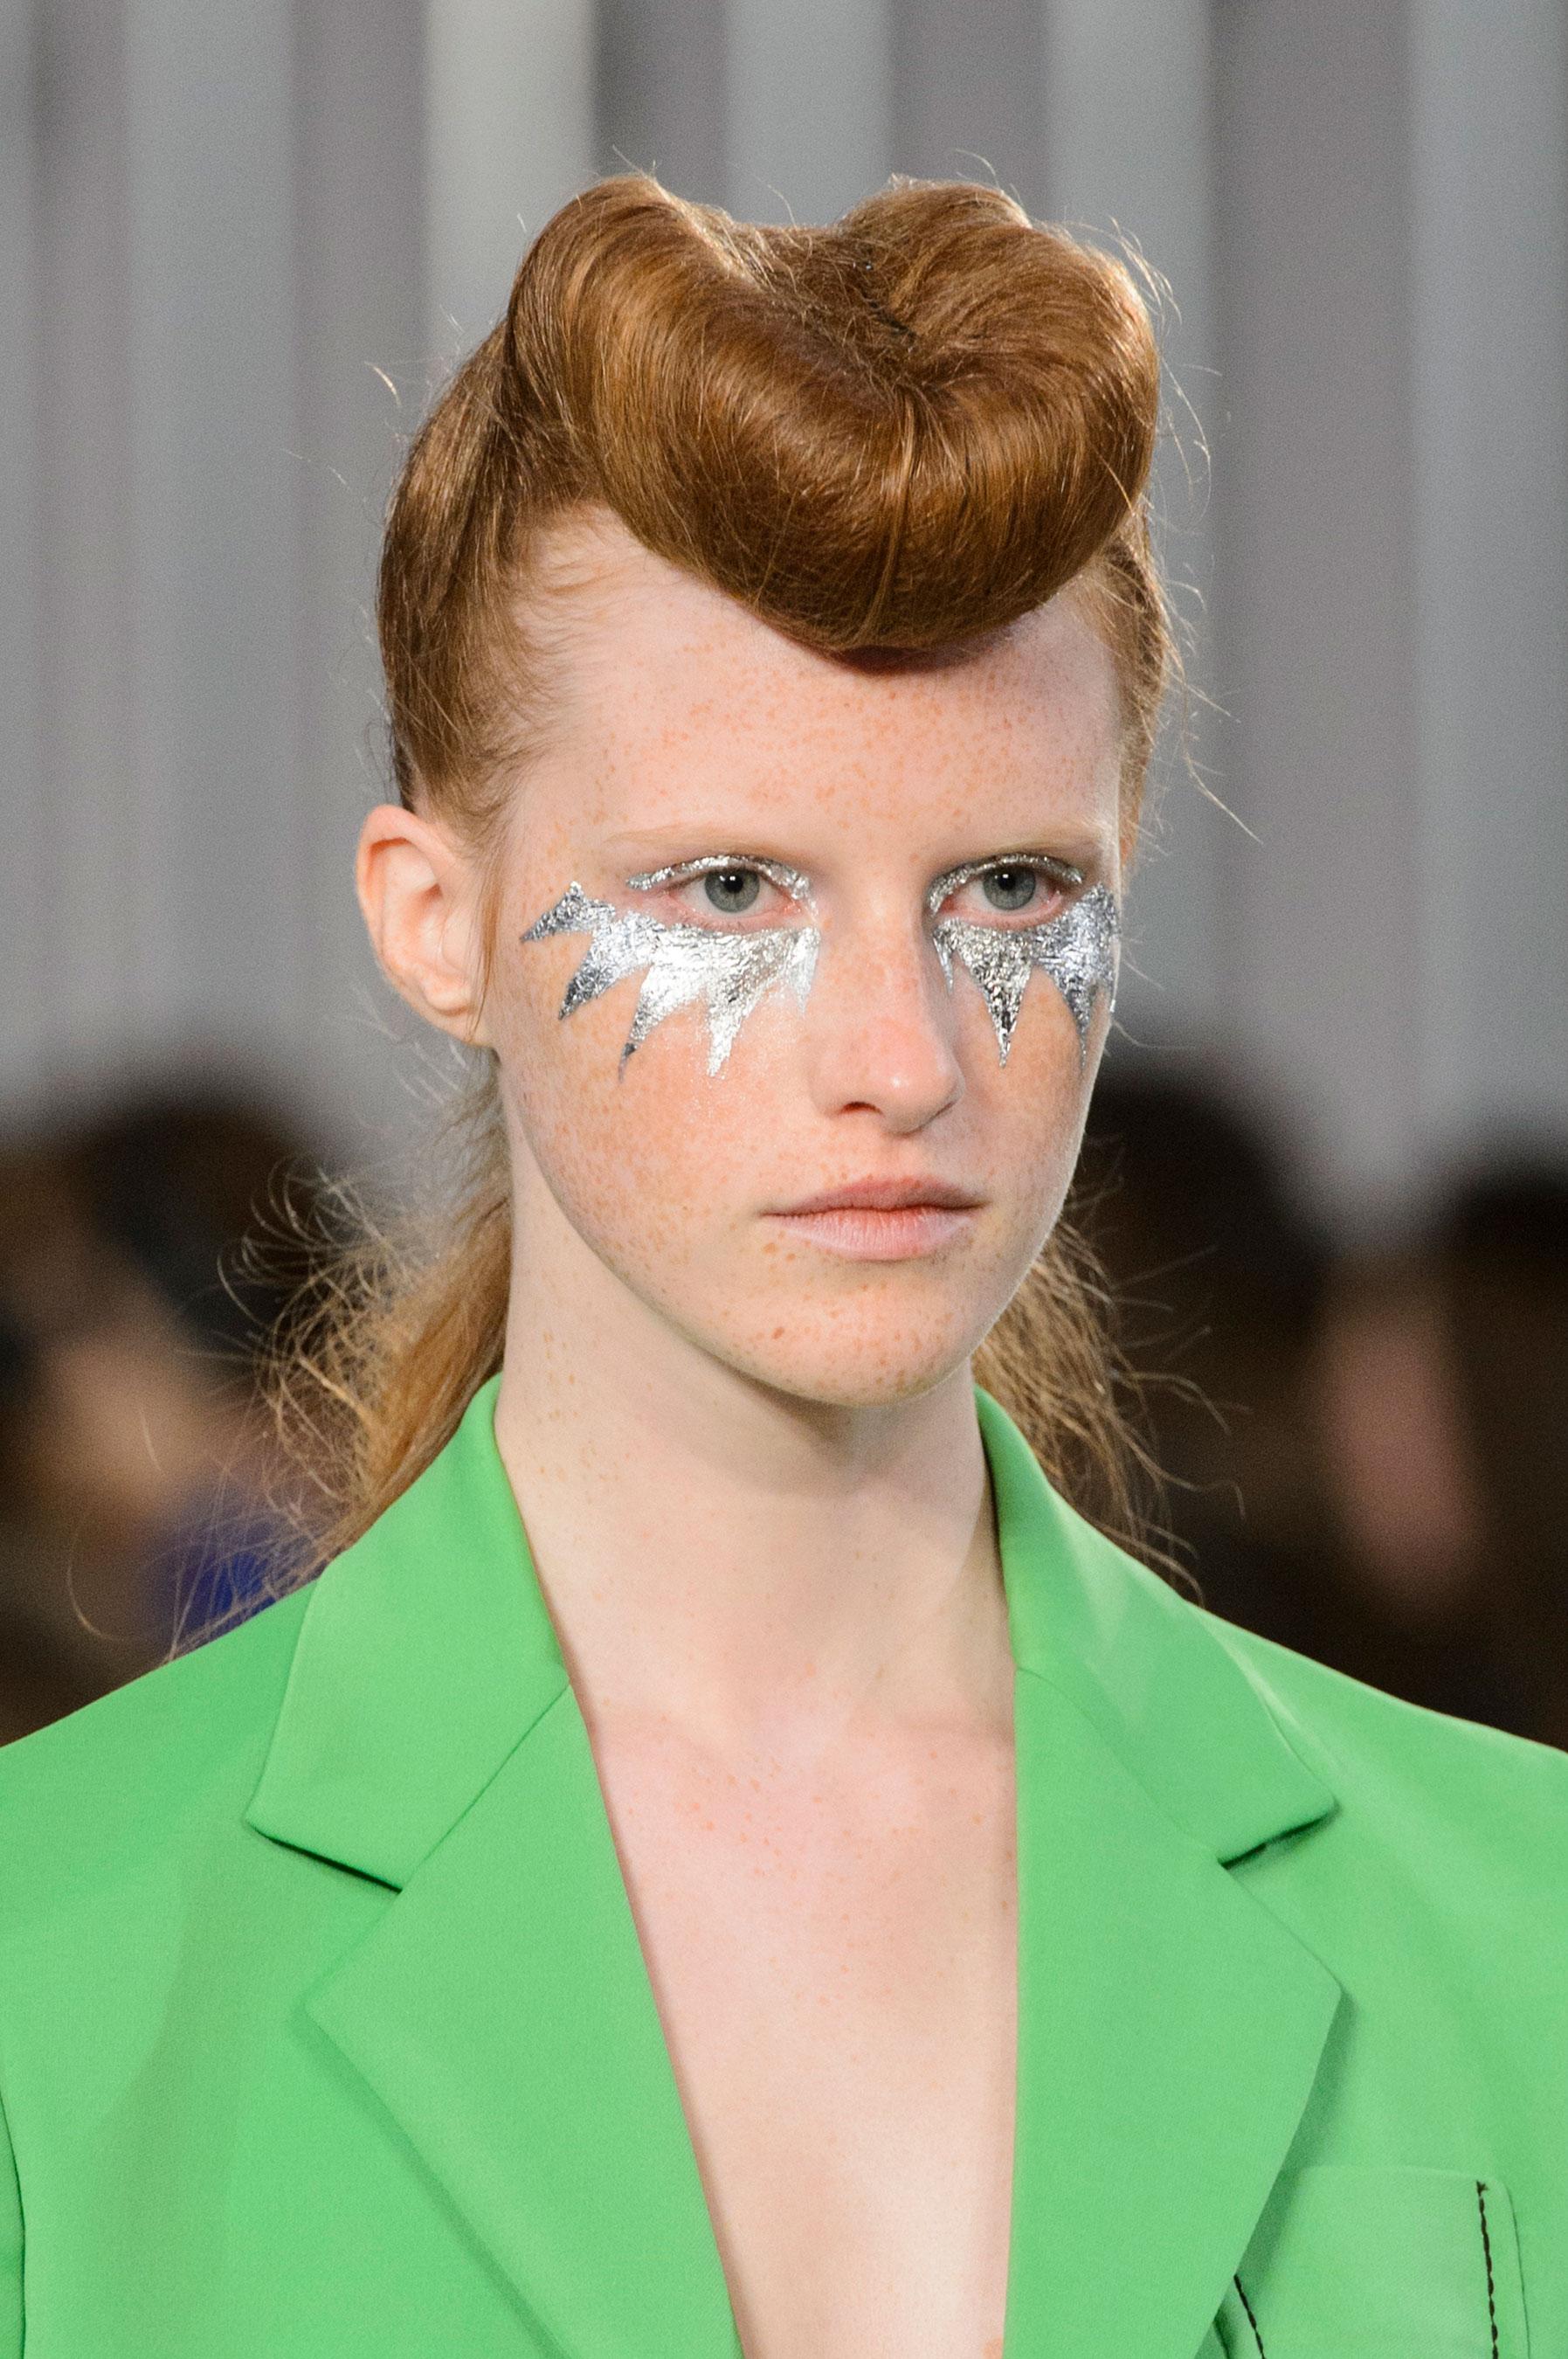 Maison-Margiela-spring-2016-runway-beauty-fashion-show-the-impression-012